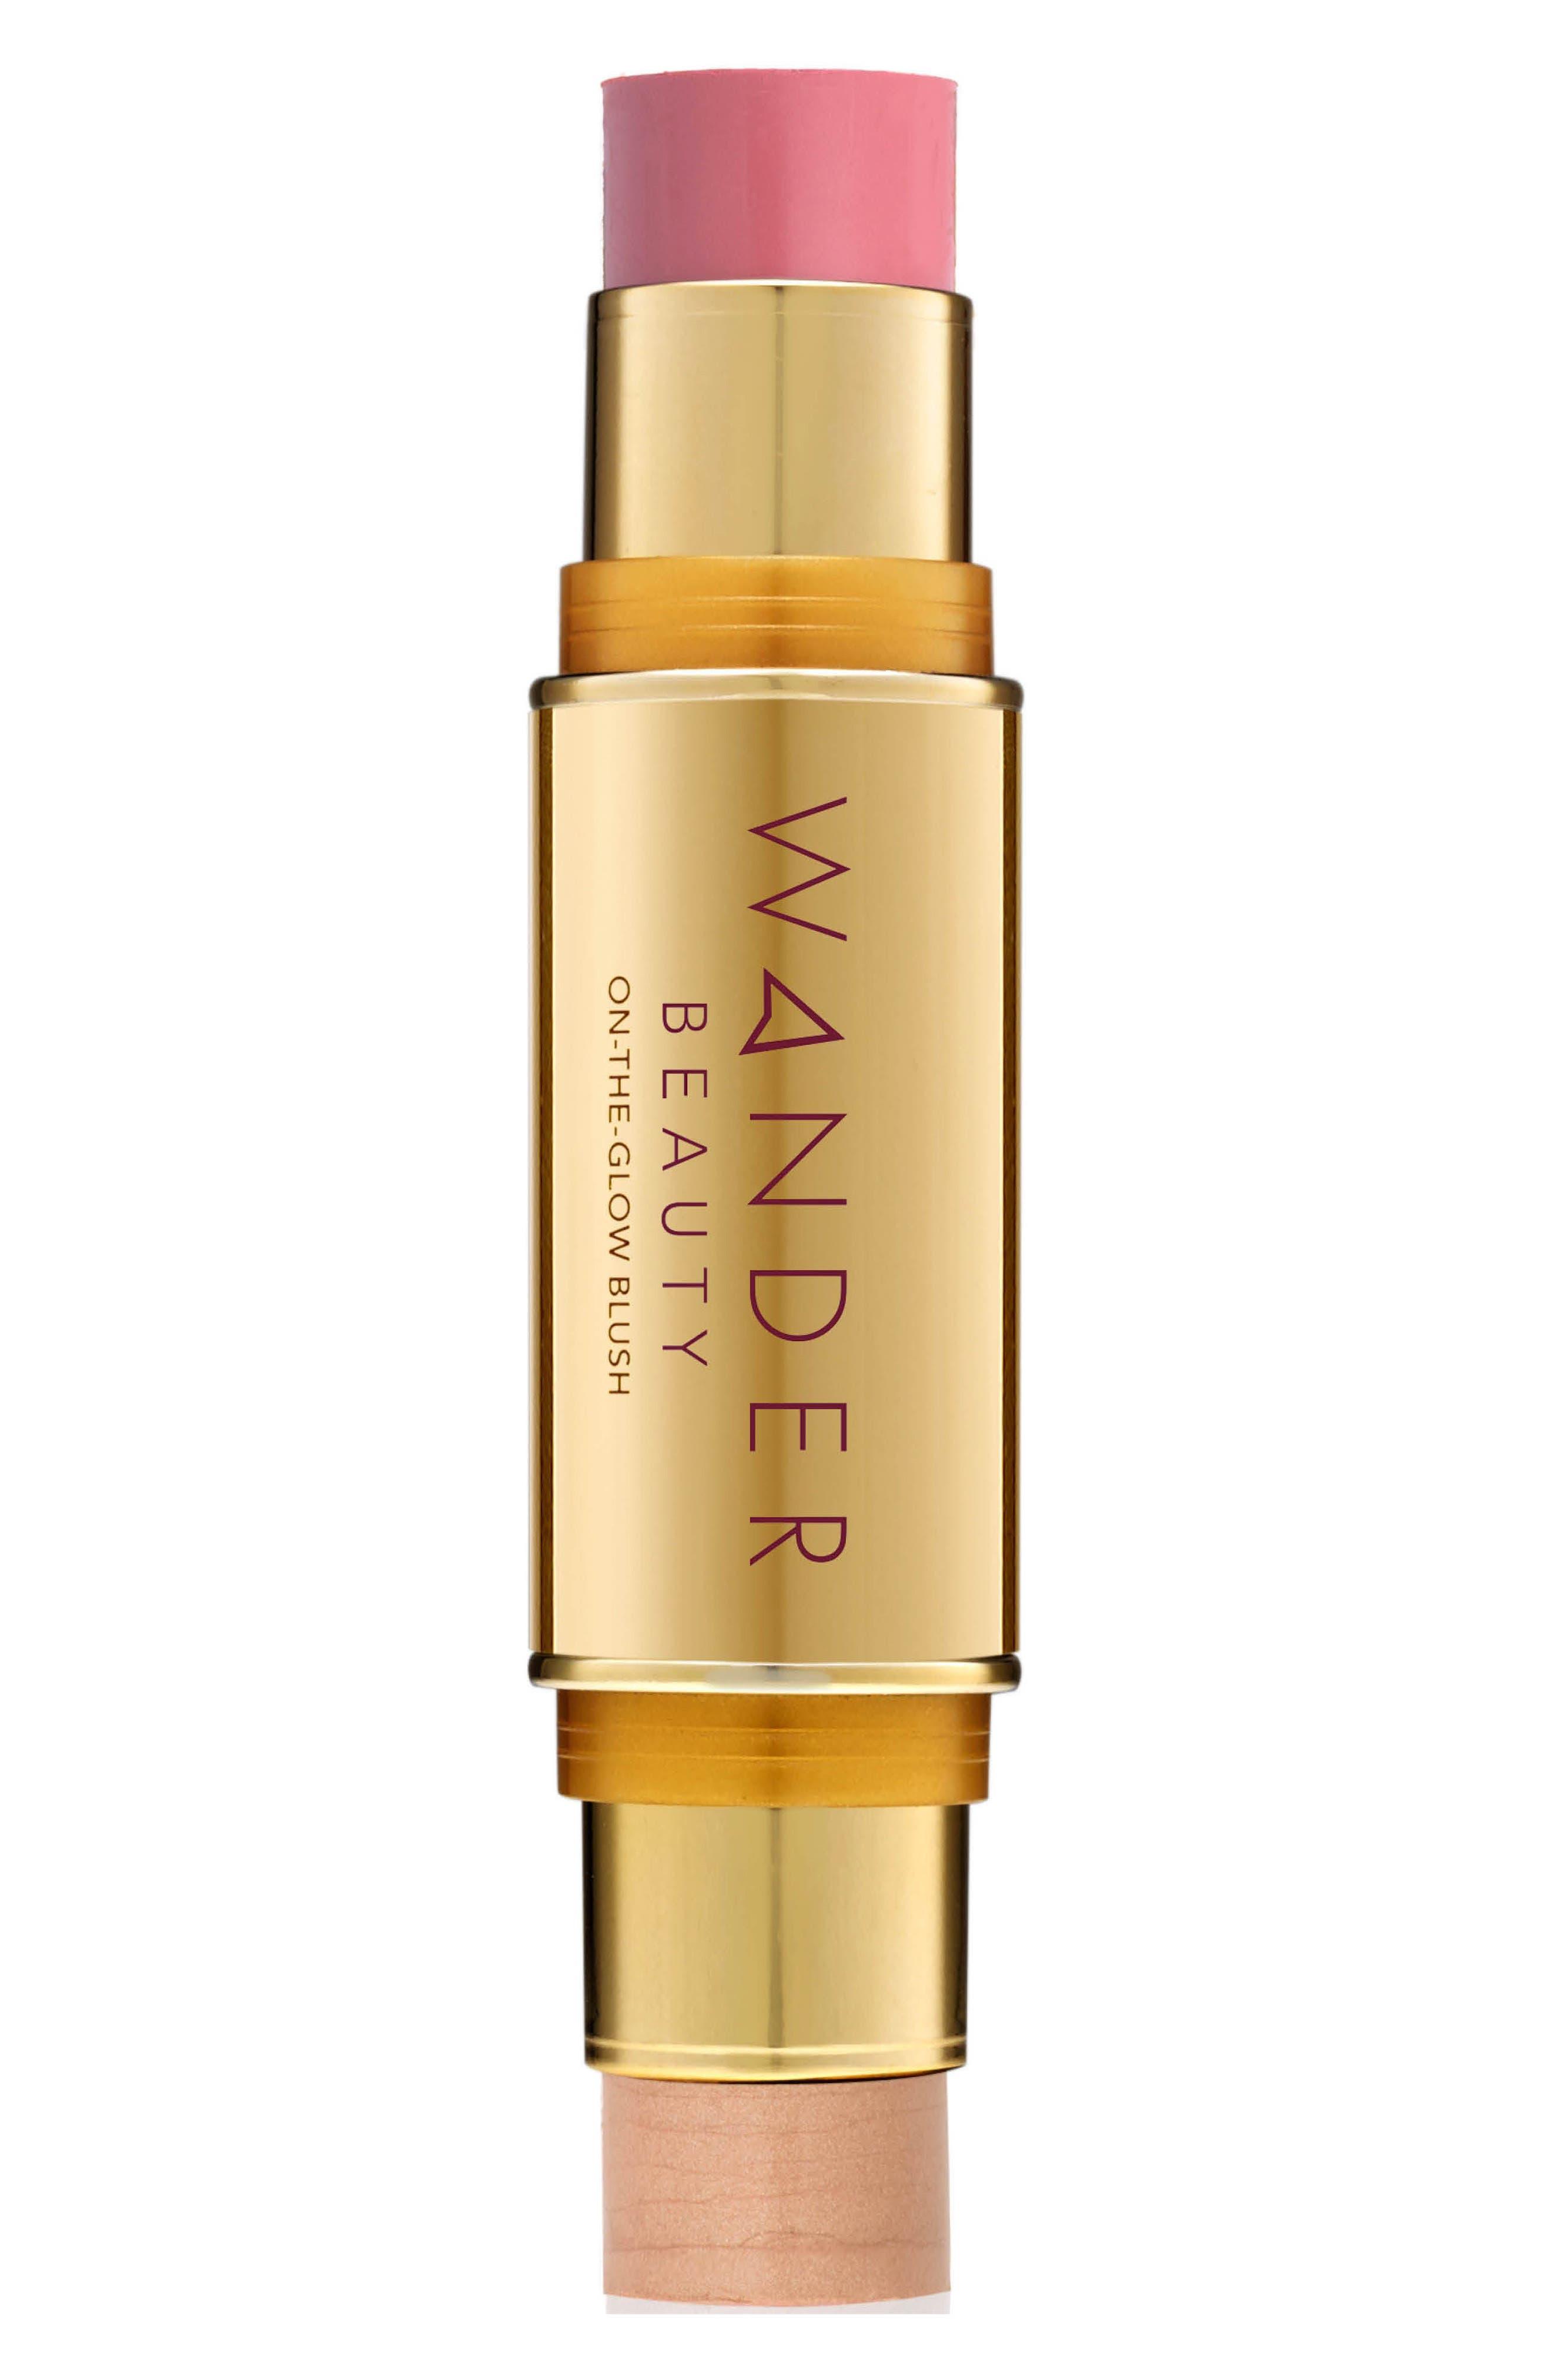 Wander Beauty On-the-Glow Blush & Illuminator